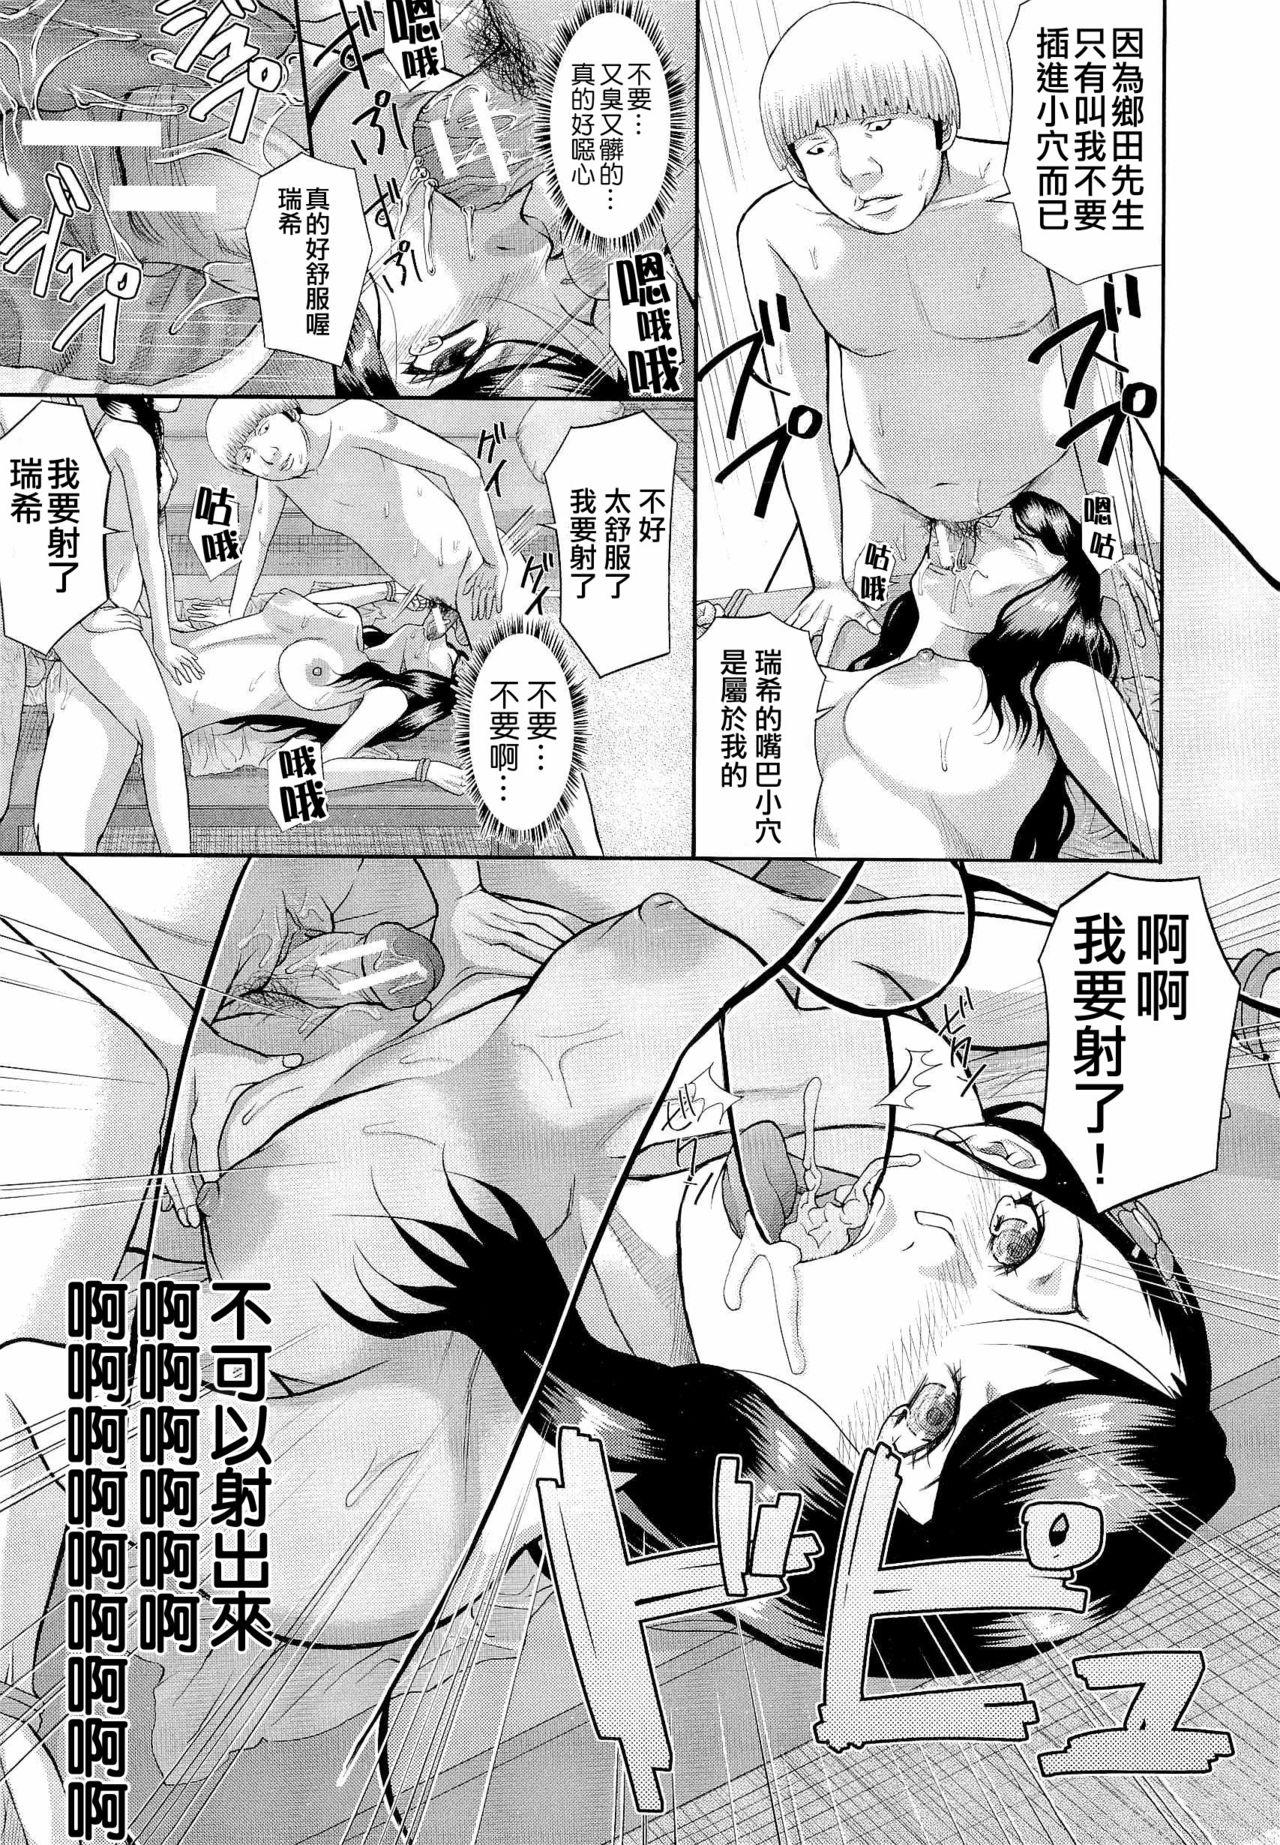 [Honebuto Danshaku] Innou Kaizou Program ~Oyako Zecchou Cult Ochi~ [Chinese]【不想记名重嵌--高质量图源】 54